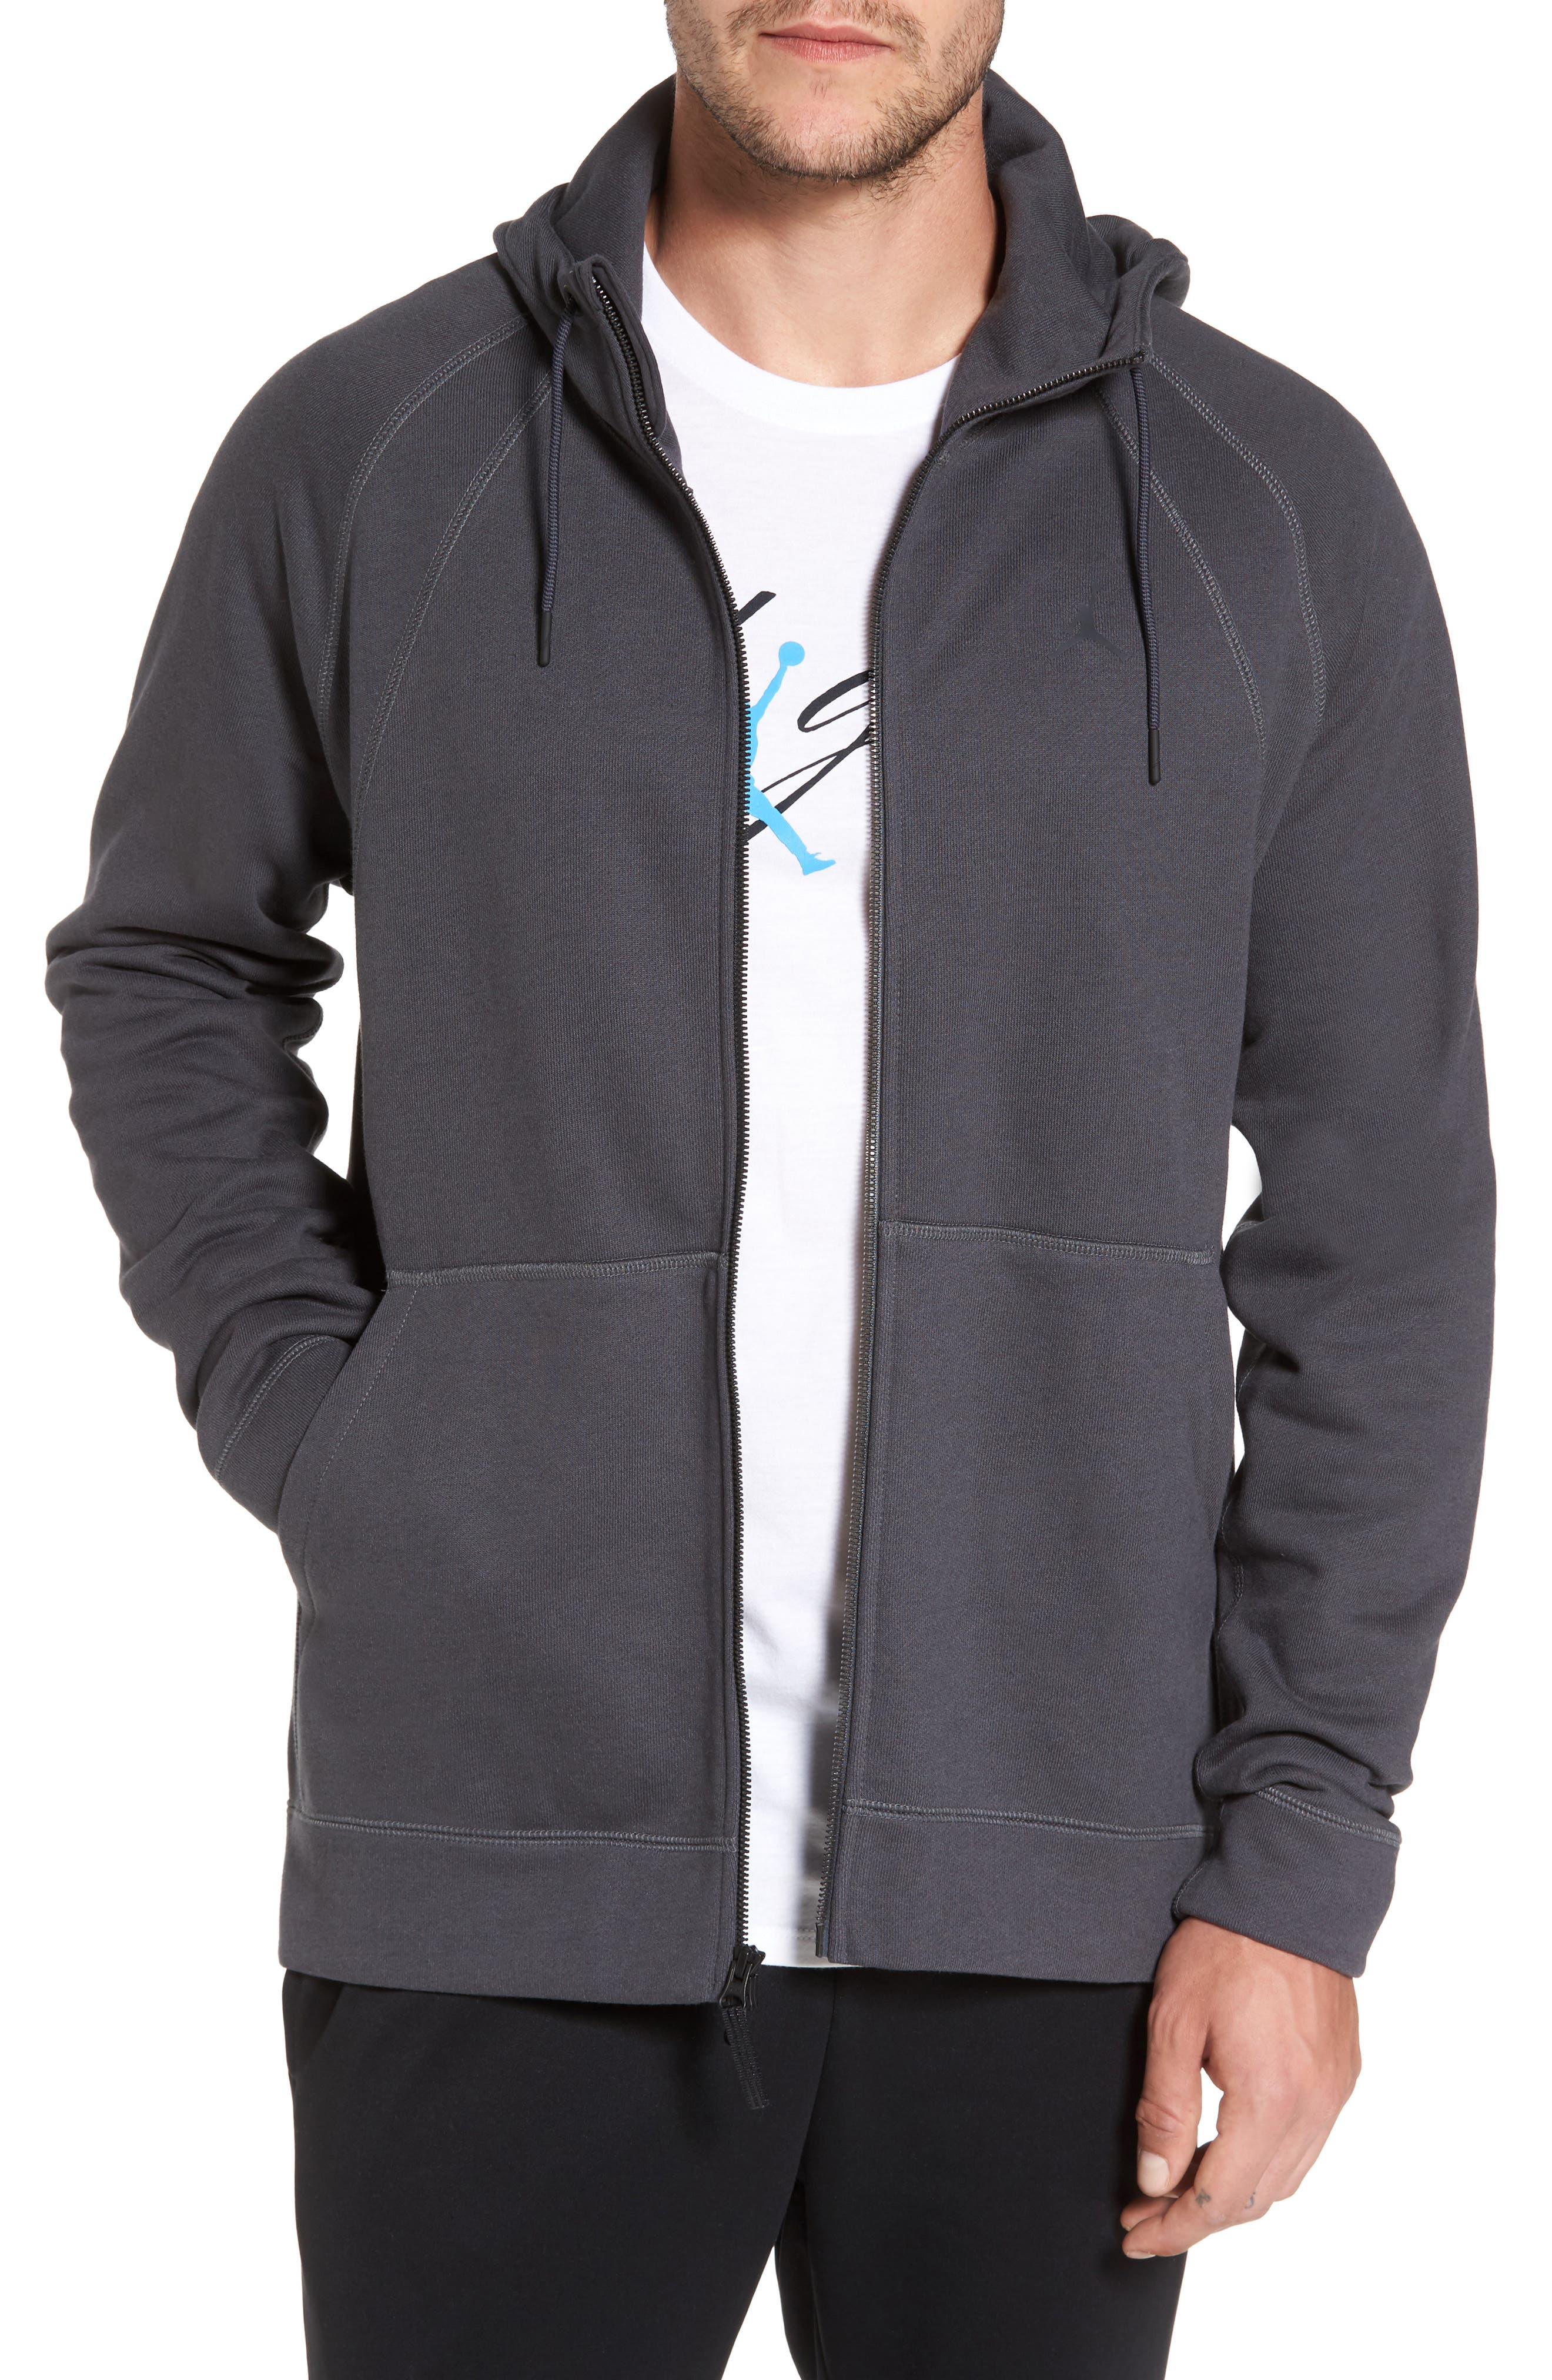 Sportswear Wings Full Zip Jacket,                         Main,                         color, Anthracite/ Black